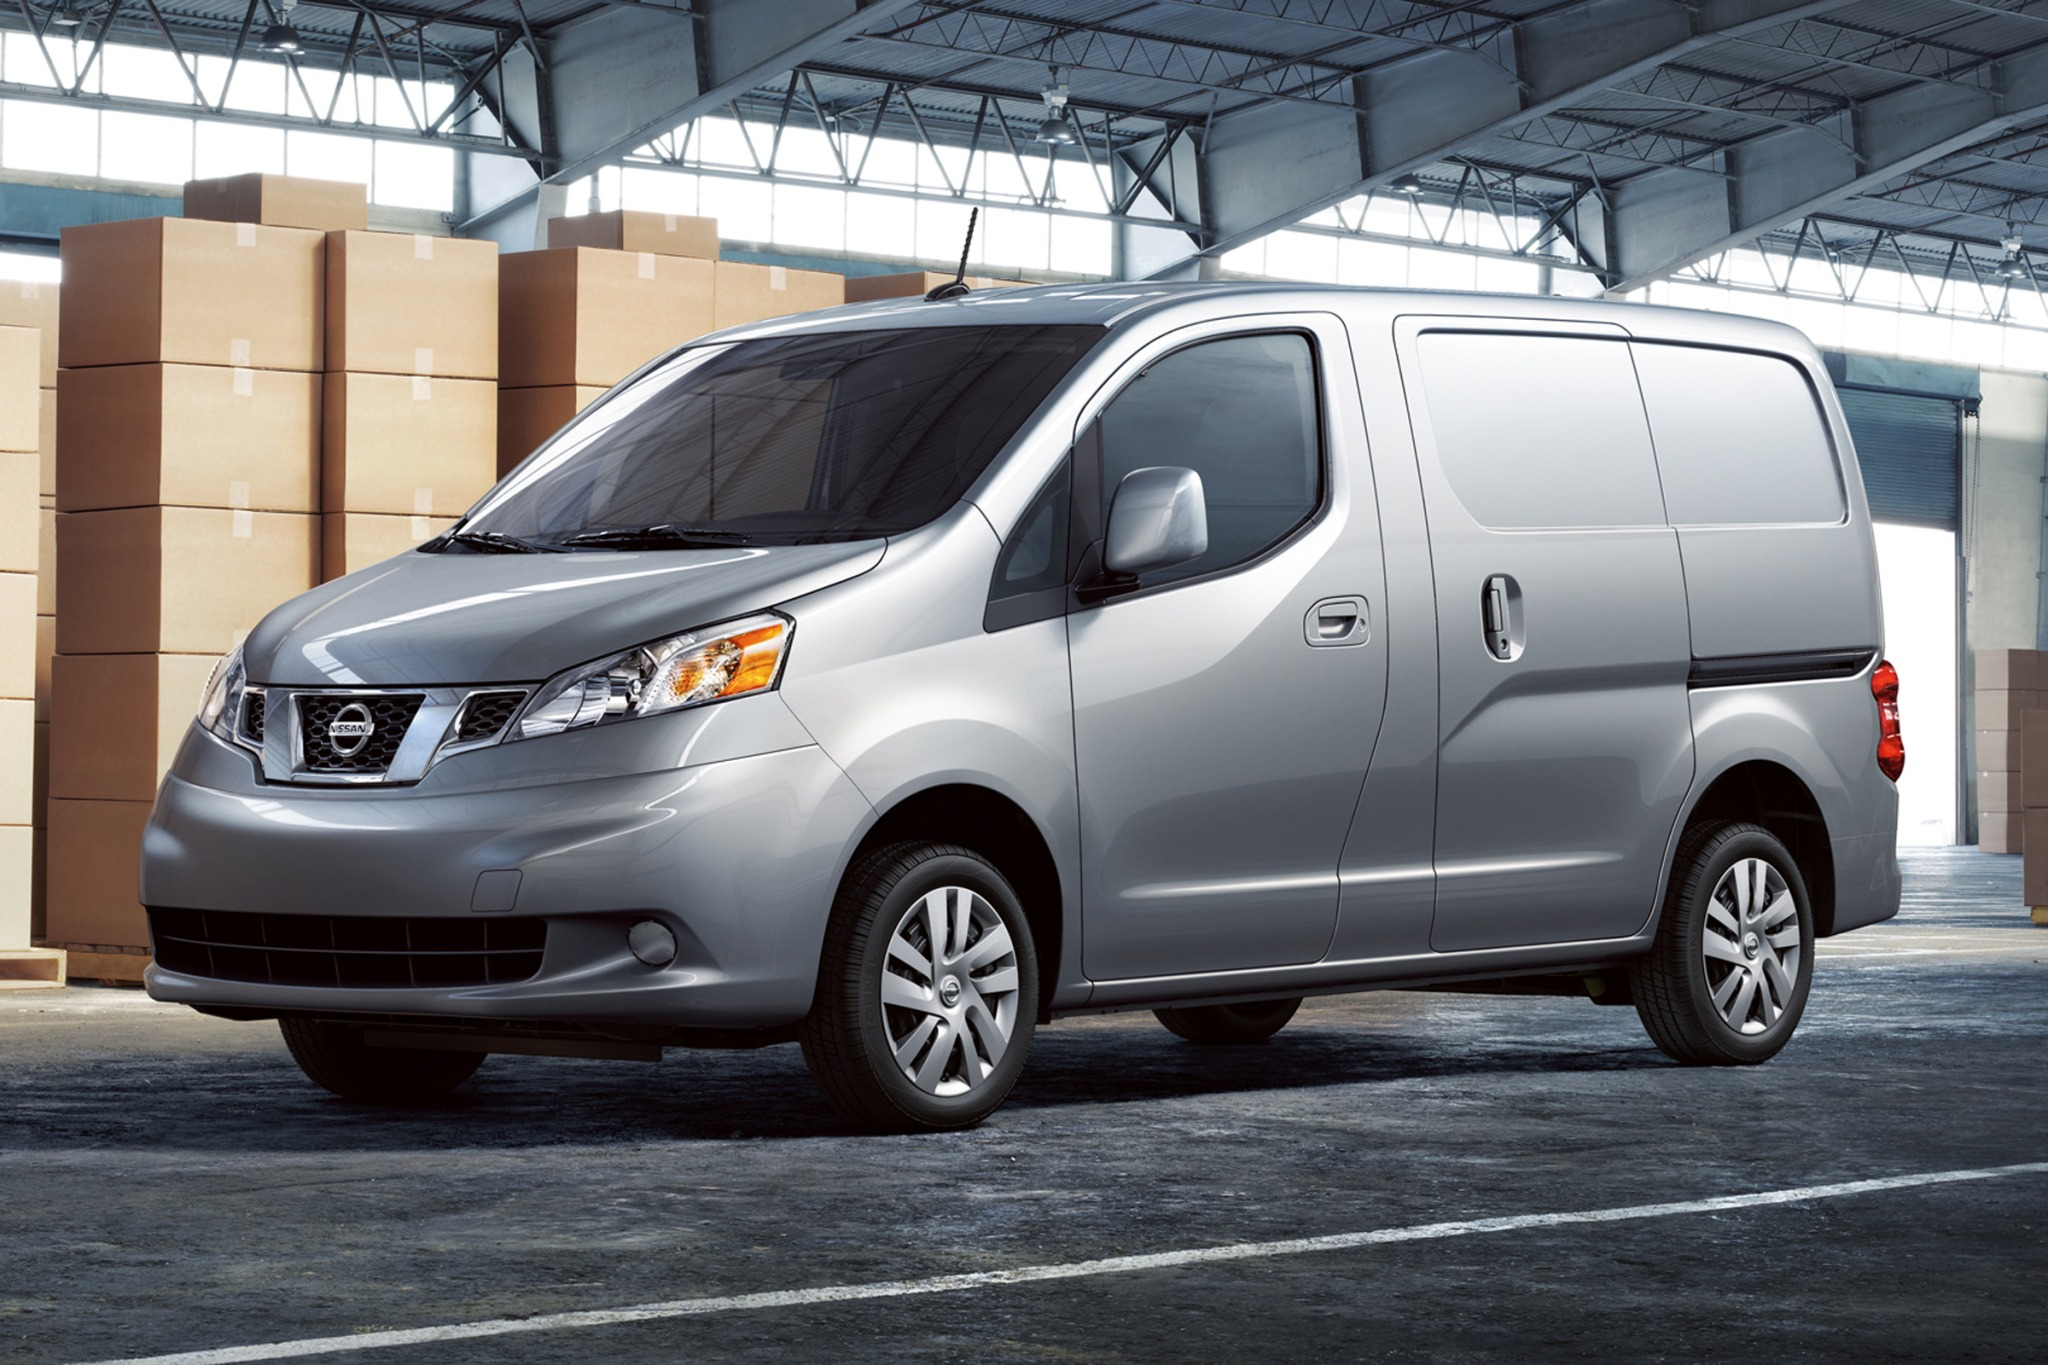 2016 nissan nv200 cargo minivan sv fq oem 1 2048